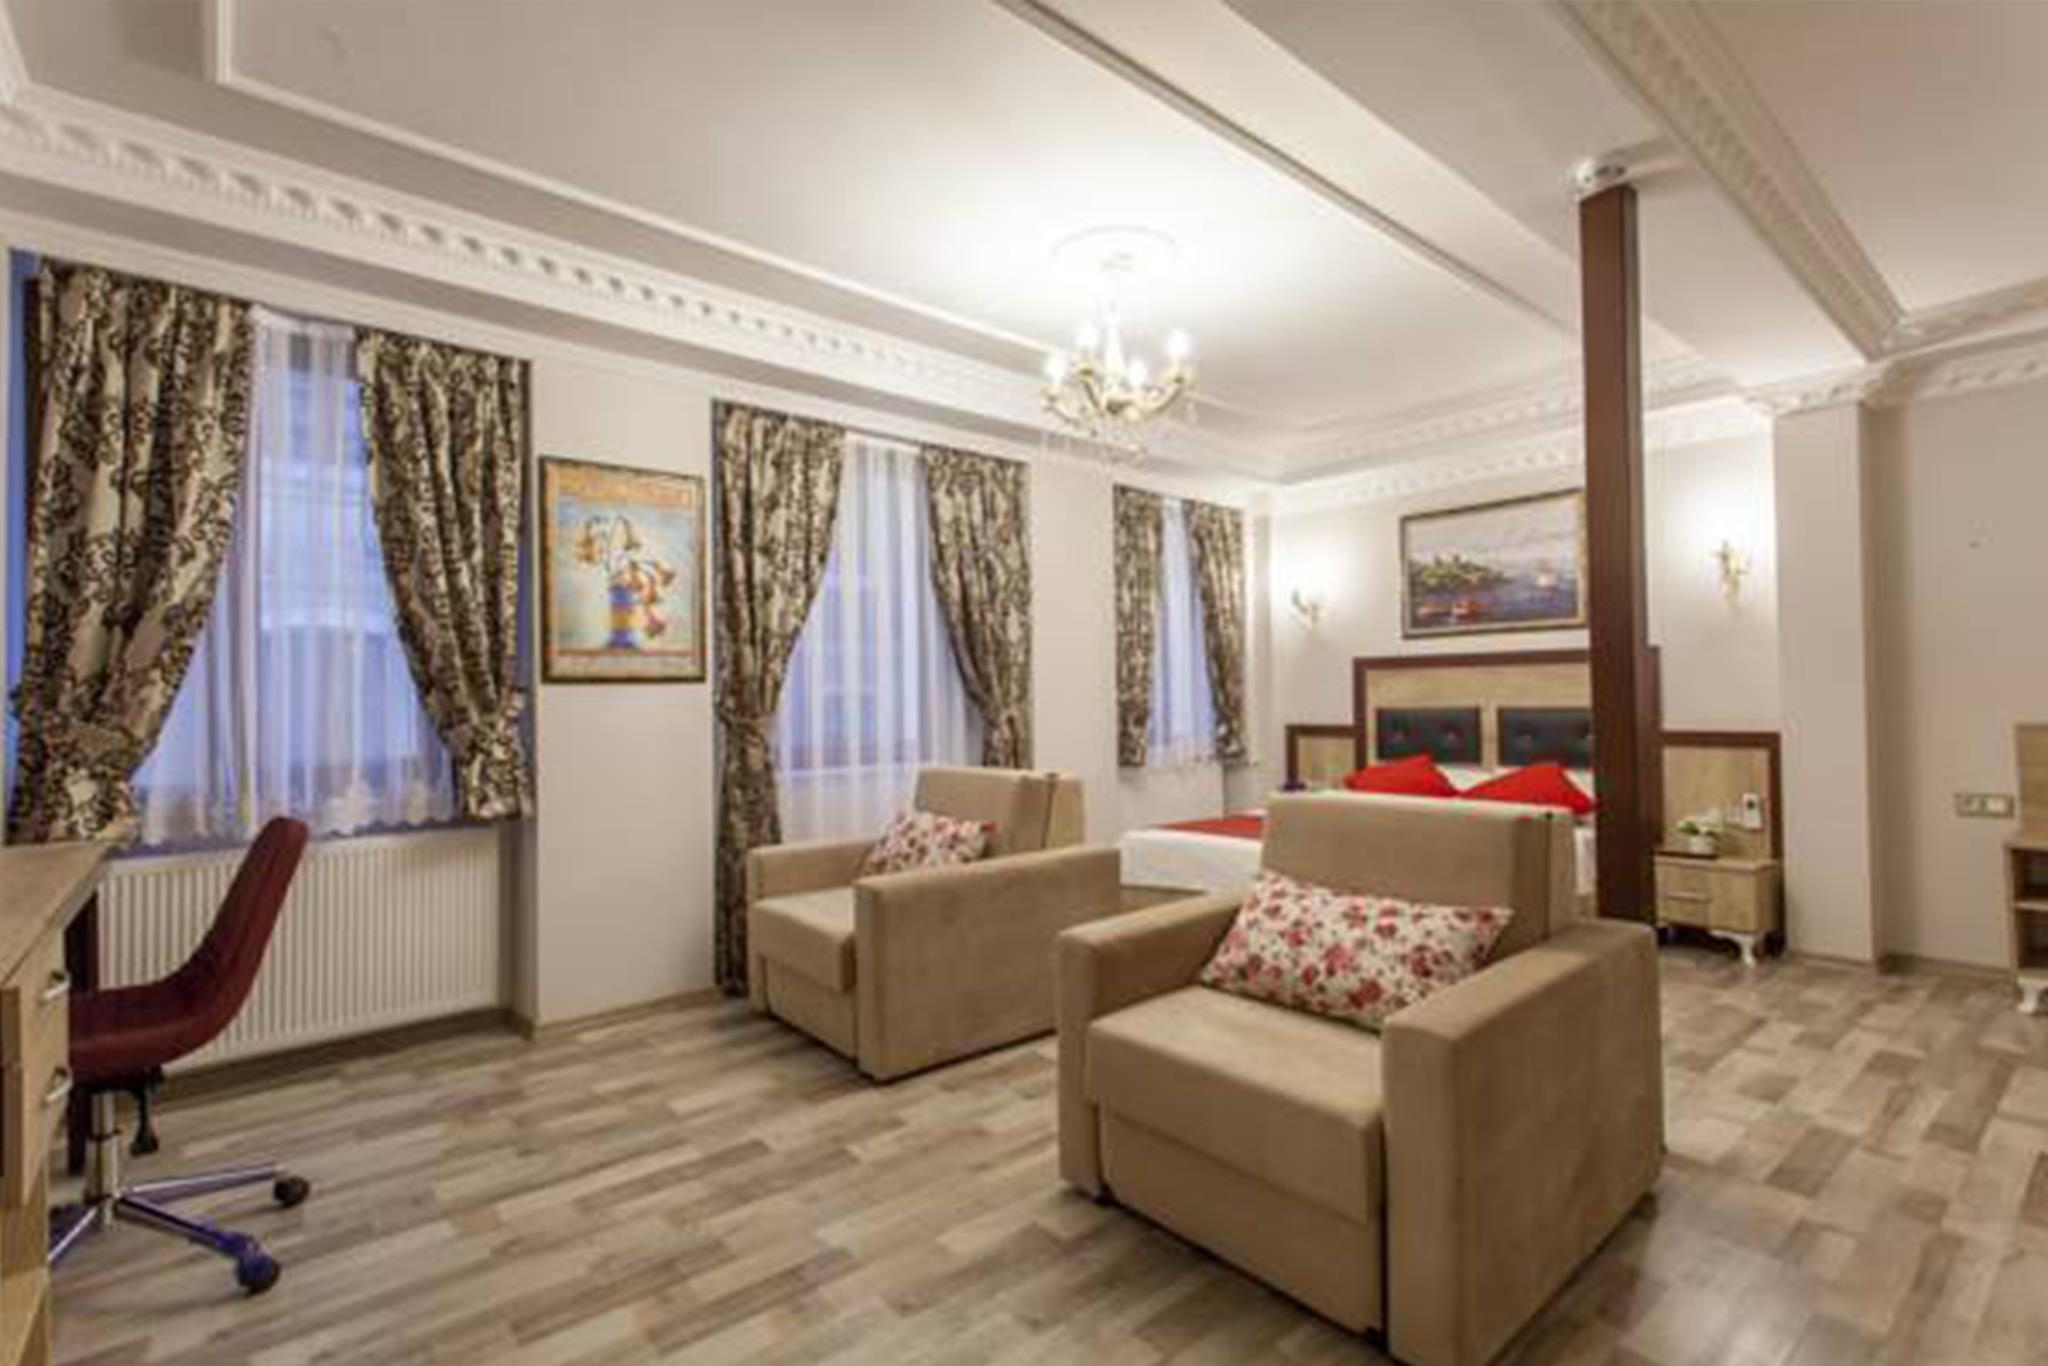 ASYA WORLD HOTEL